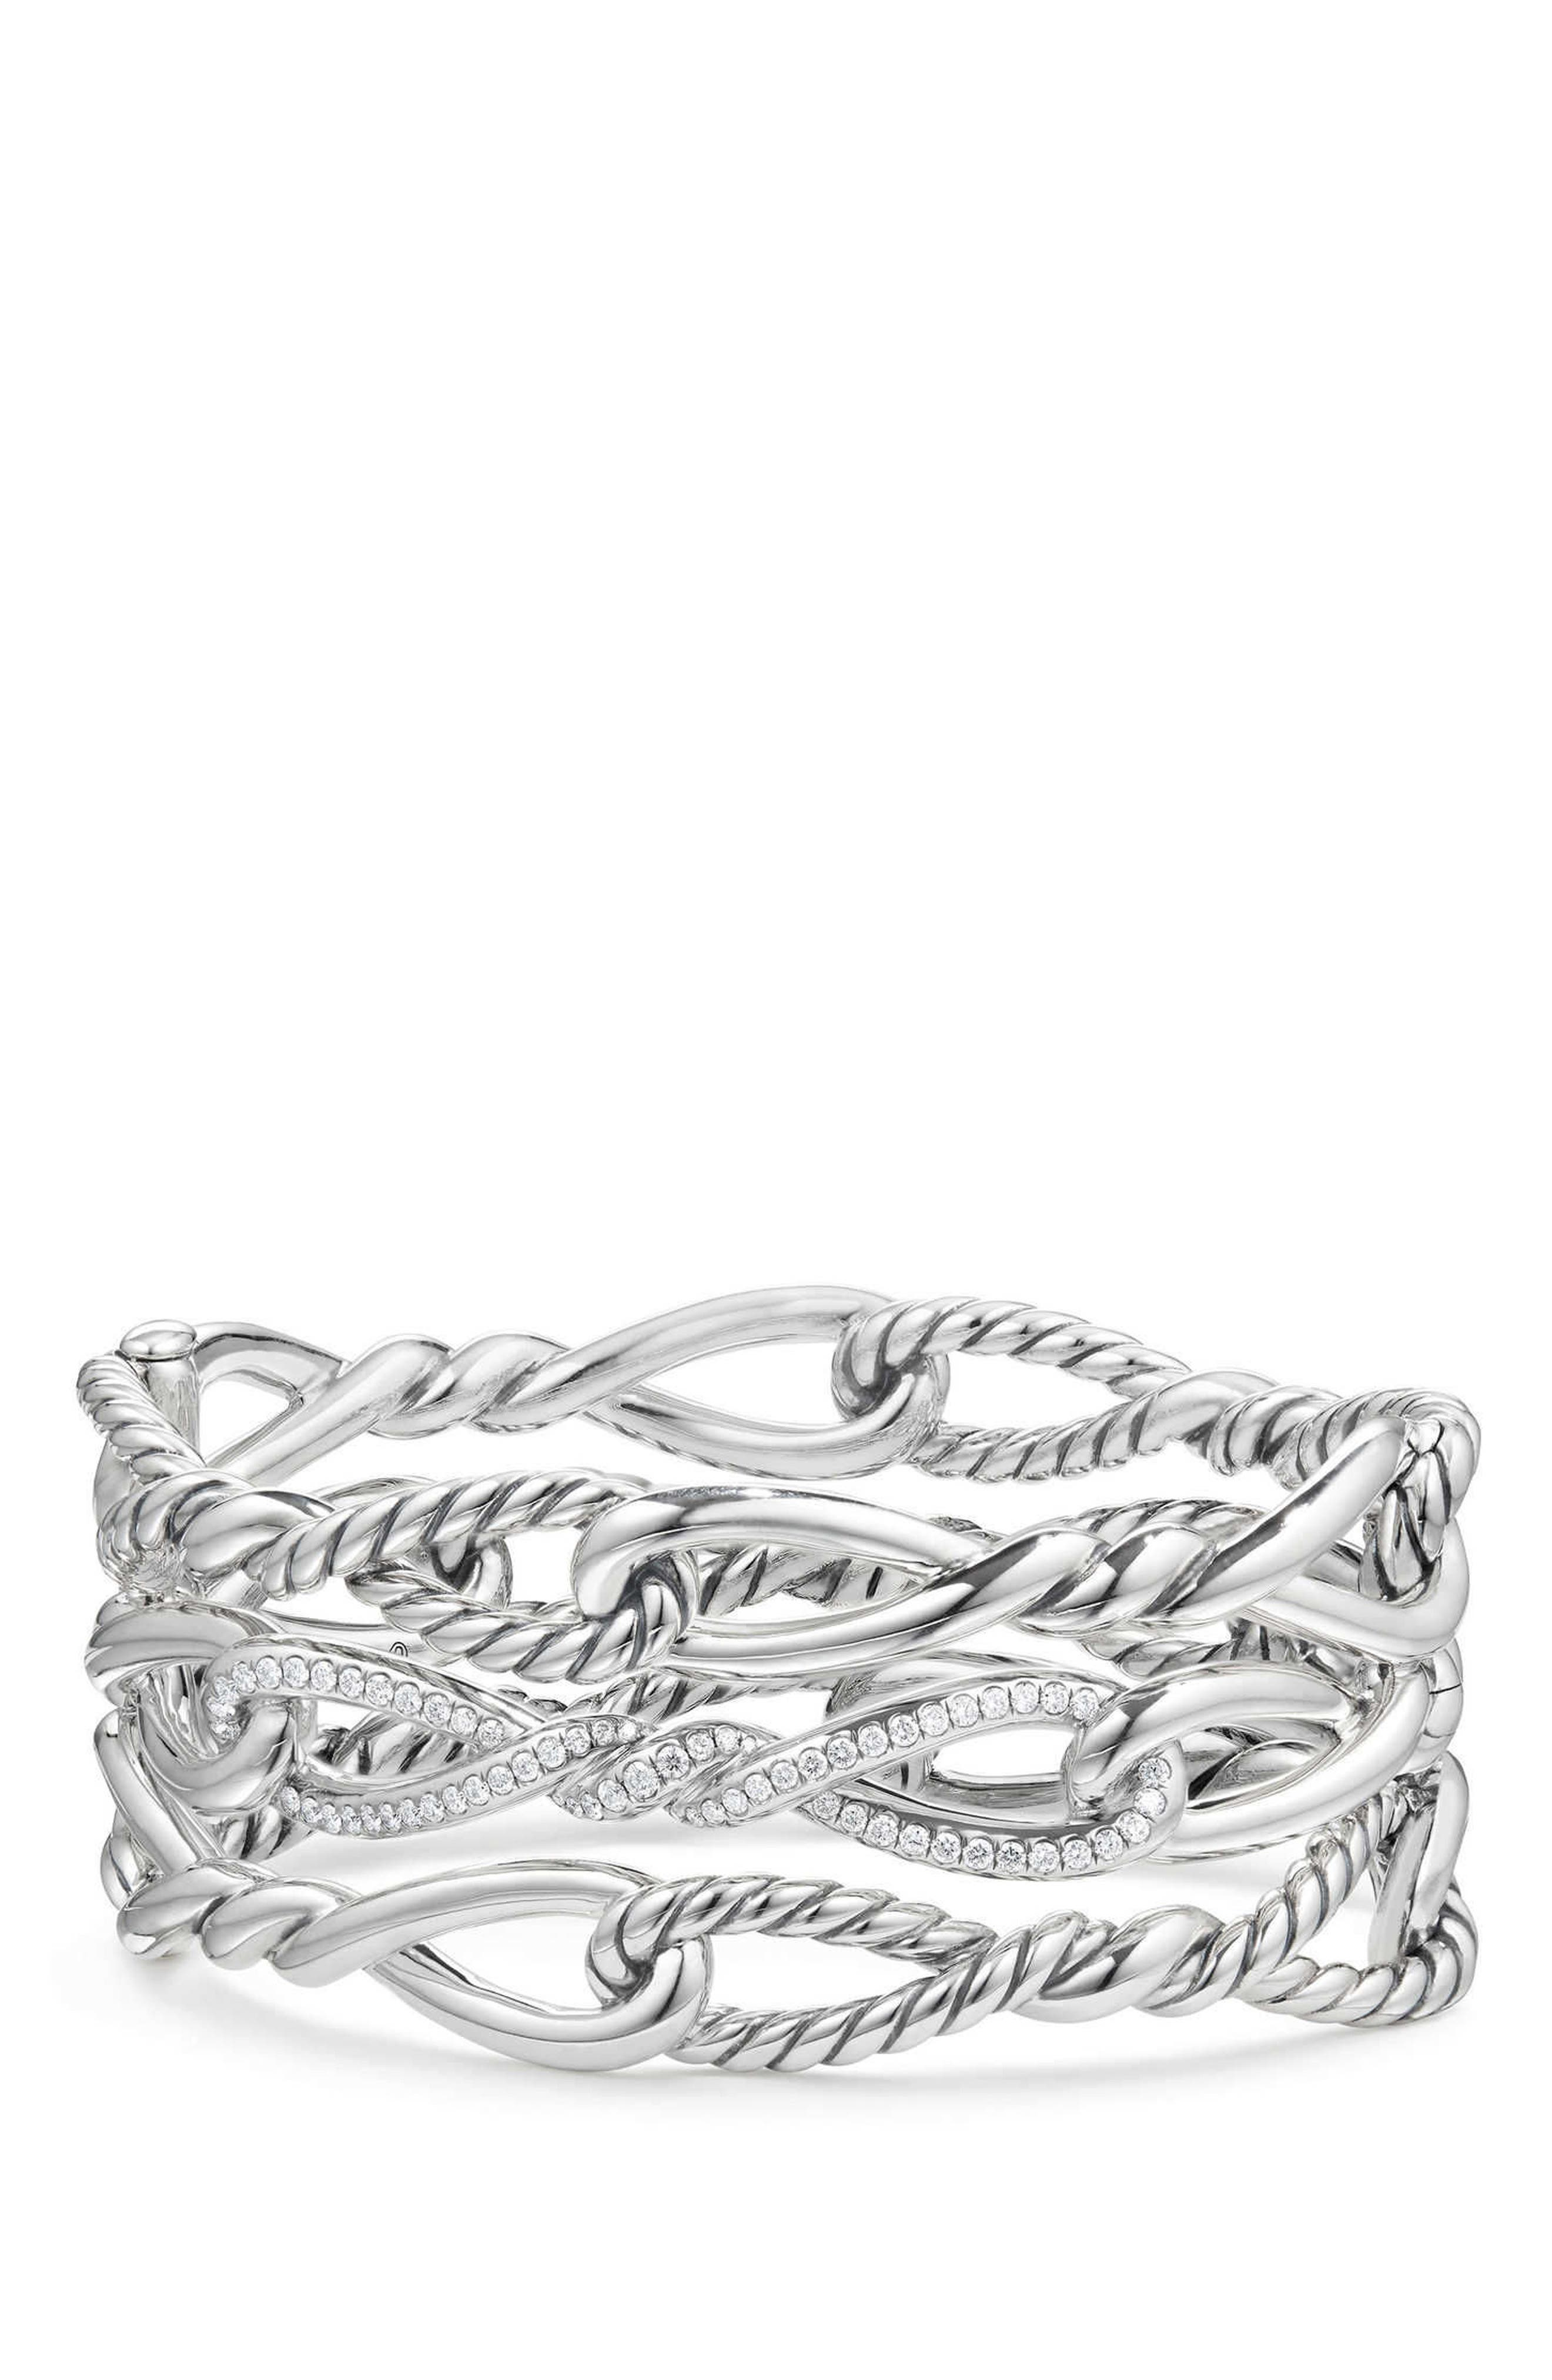 Alternate Image 1 Selected - David Yurman Continuance Multi Row Cuff Bracelet with Diamonds